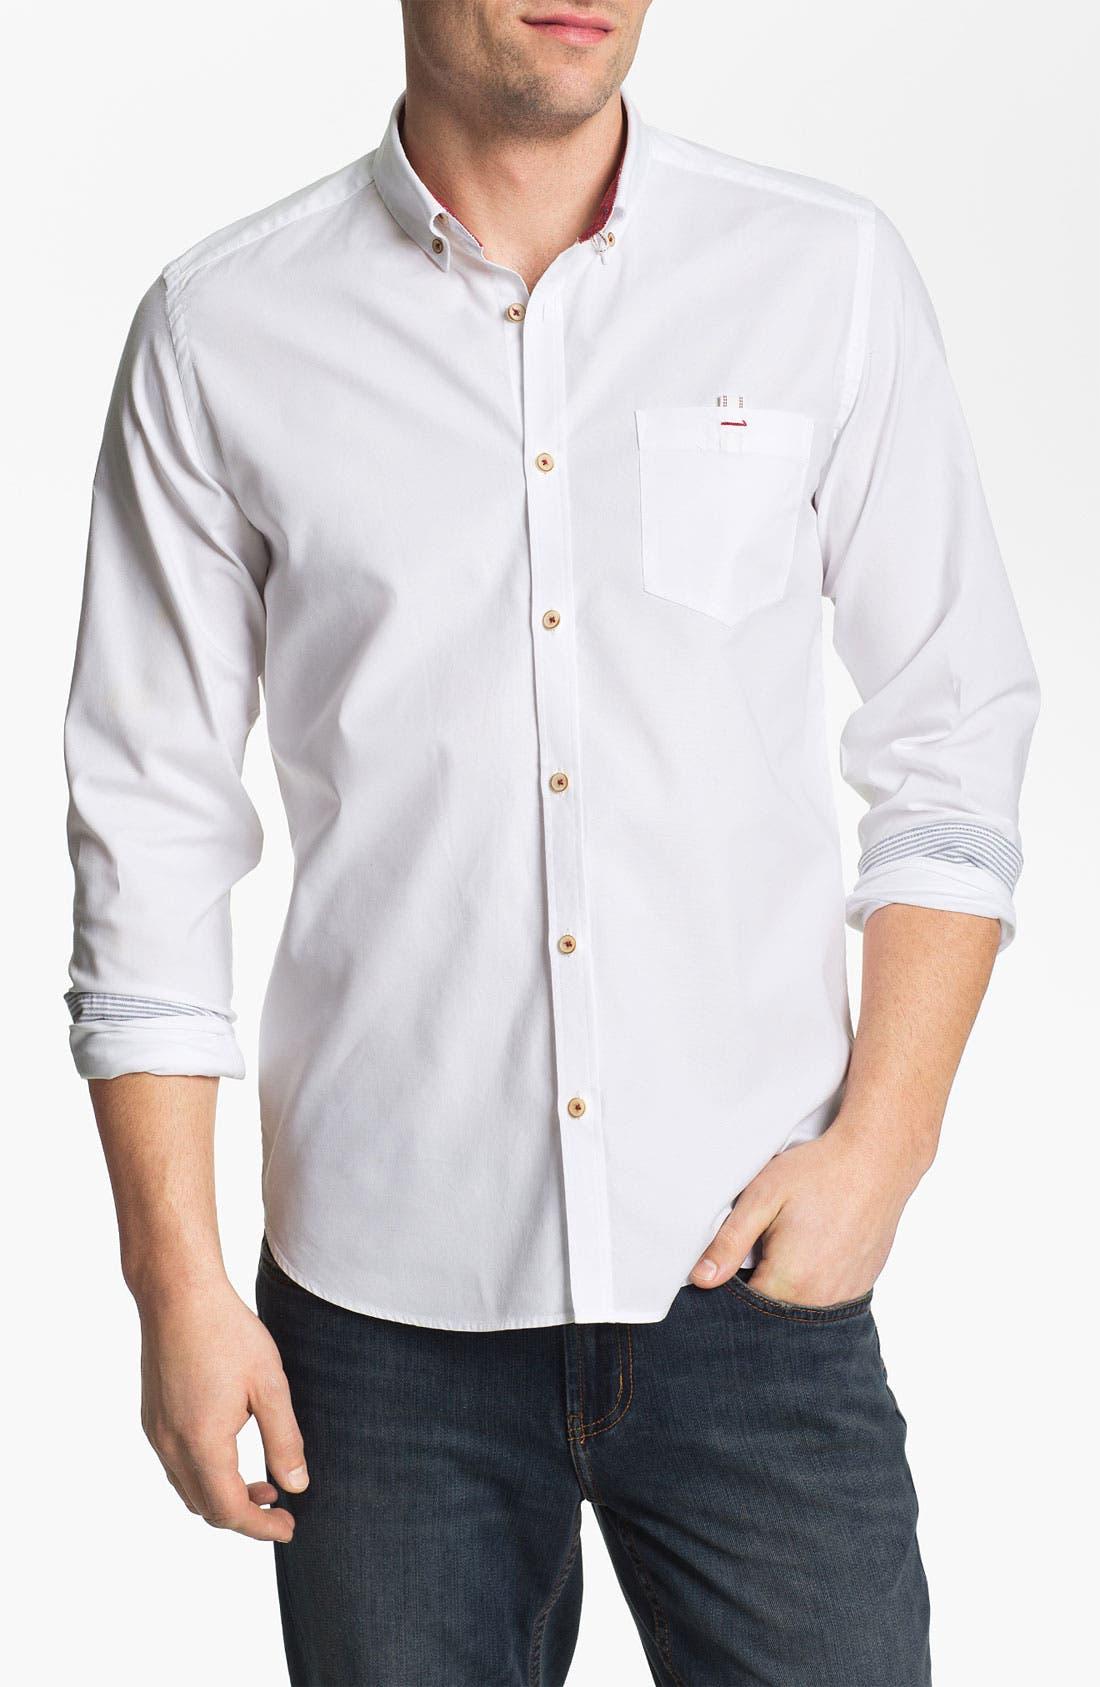 Alternate Image 1 Selected - HUGO Sportcoat, Ted Baker London Sport Shirt & Baldwin Jeans